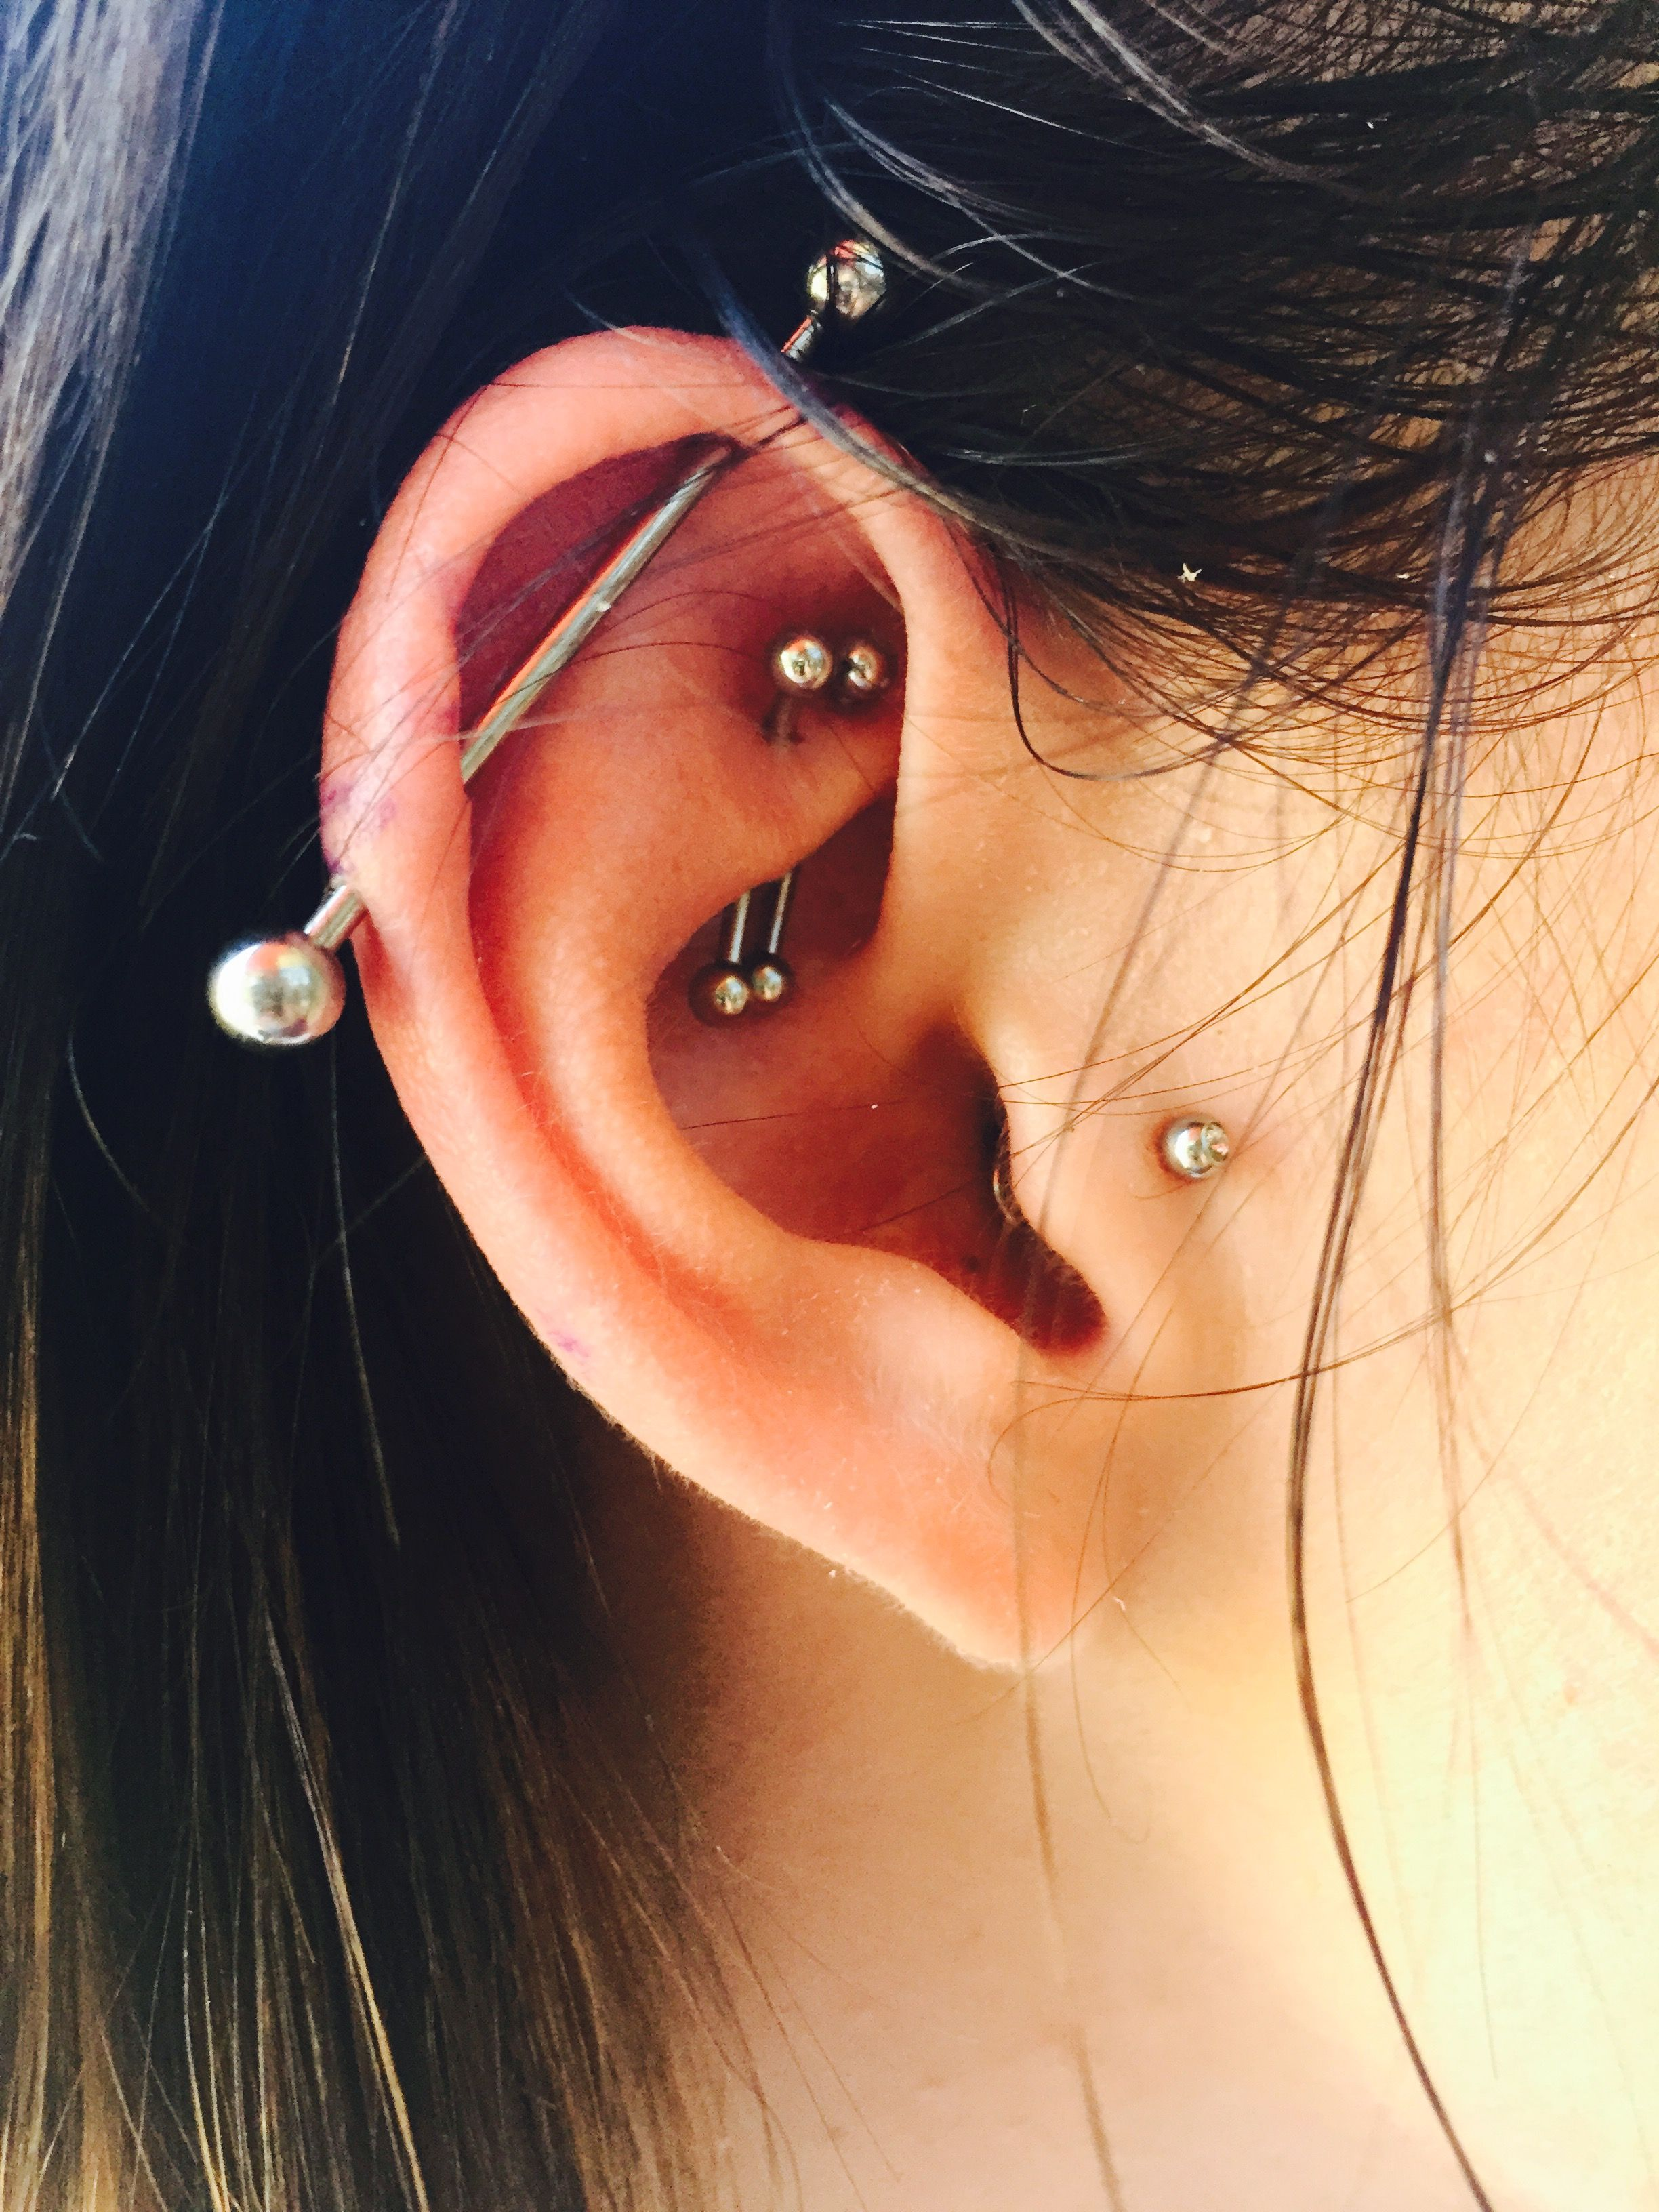 Piercing jewellery names  Pin by Kelsey Ward on Piercings  Pinterest  Piercings Tragus and